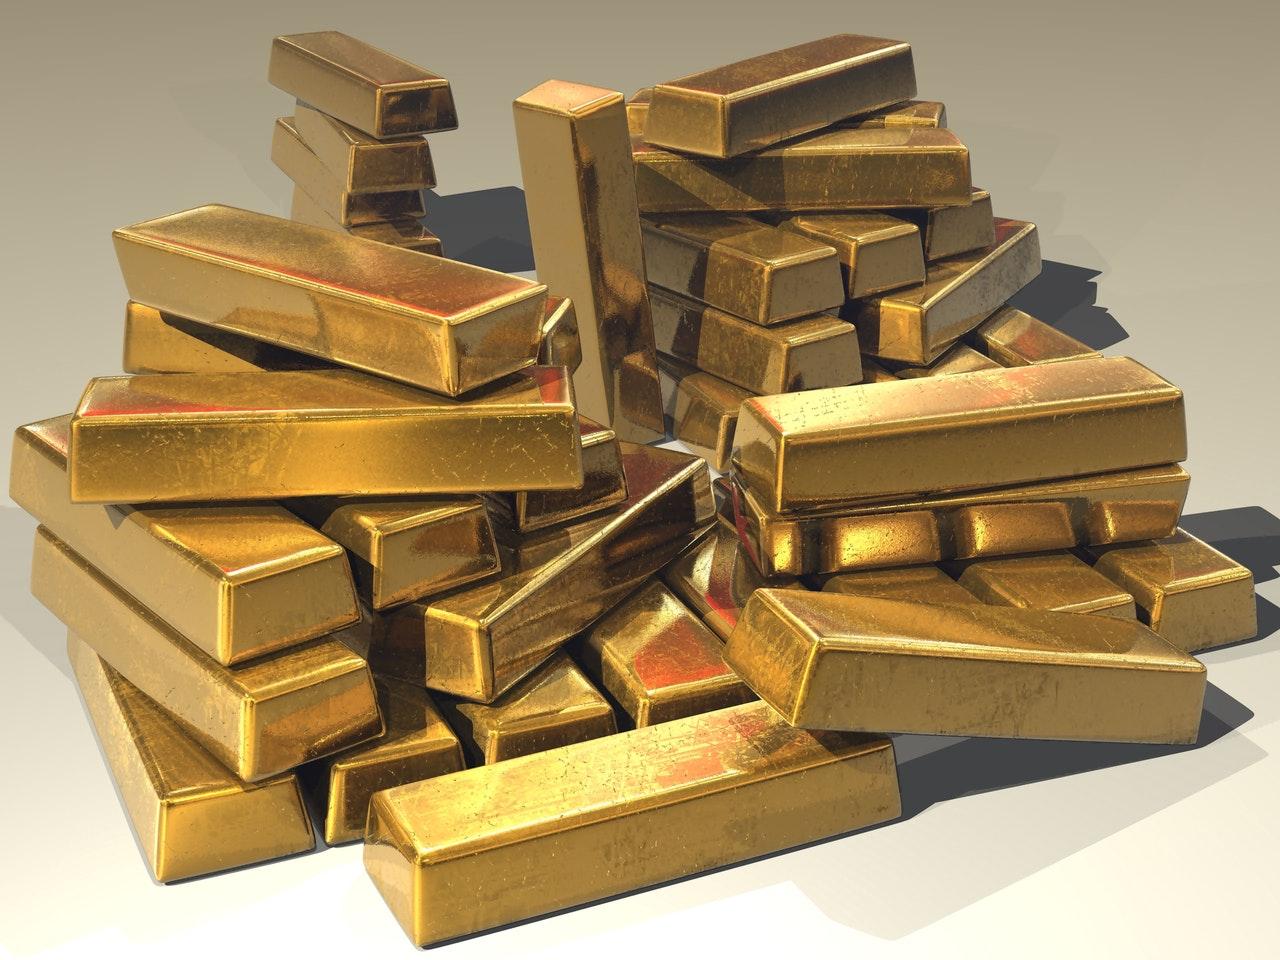 Is God Against Believers Having Lots of Money?